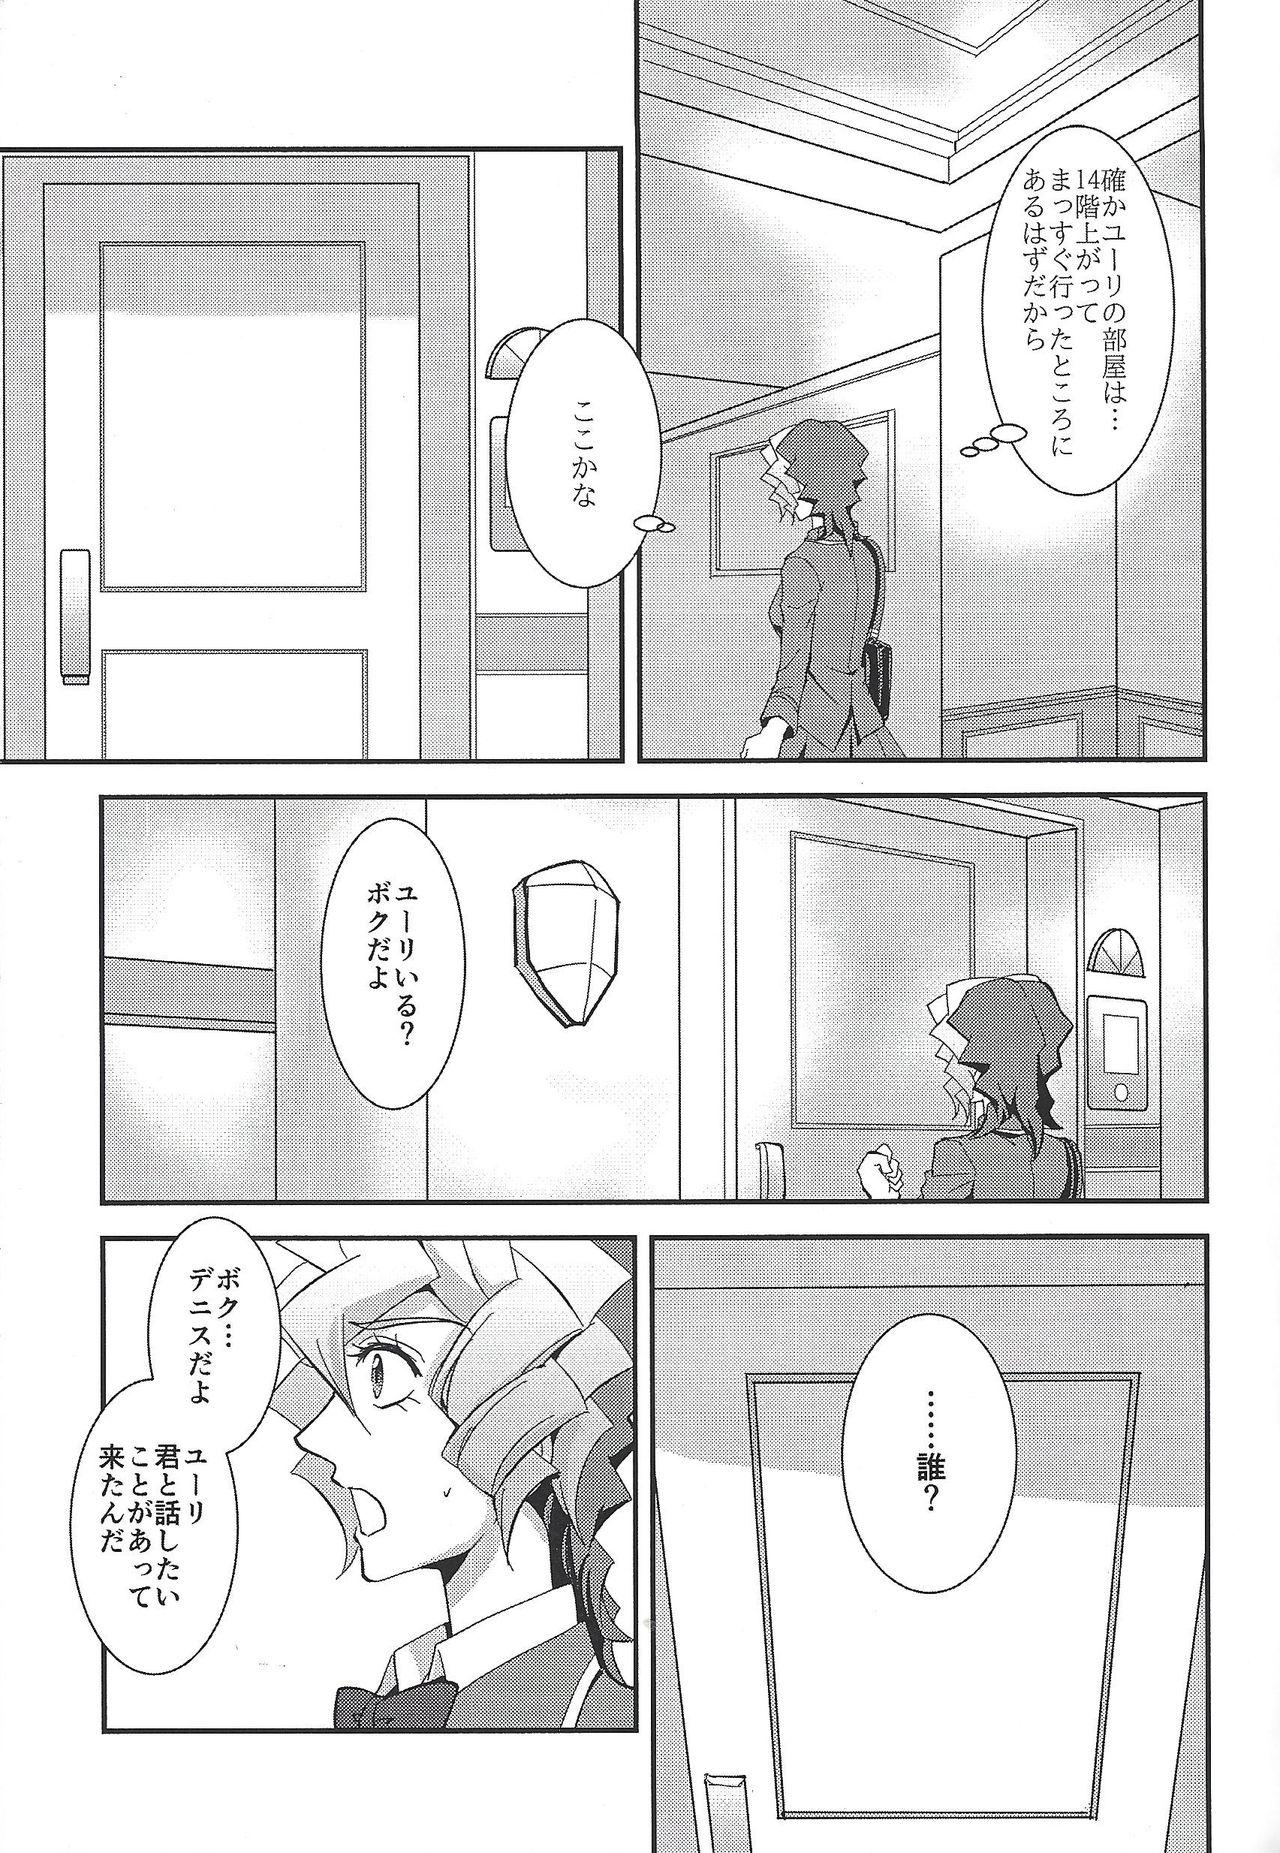 Saitei na Koi o Shiyou 39